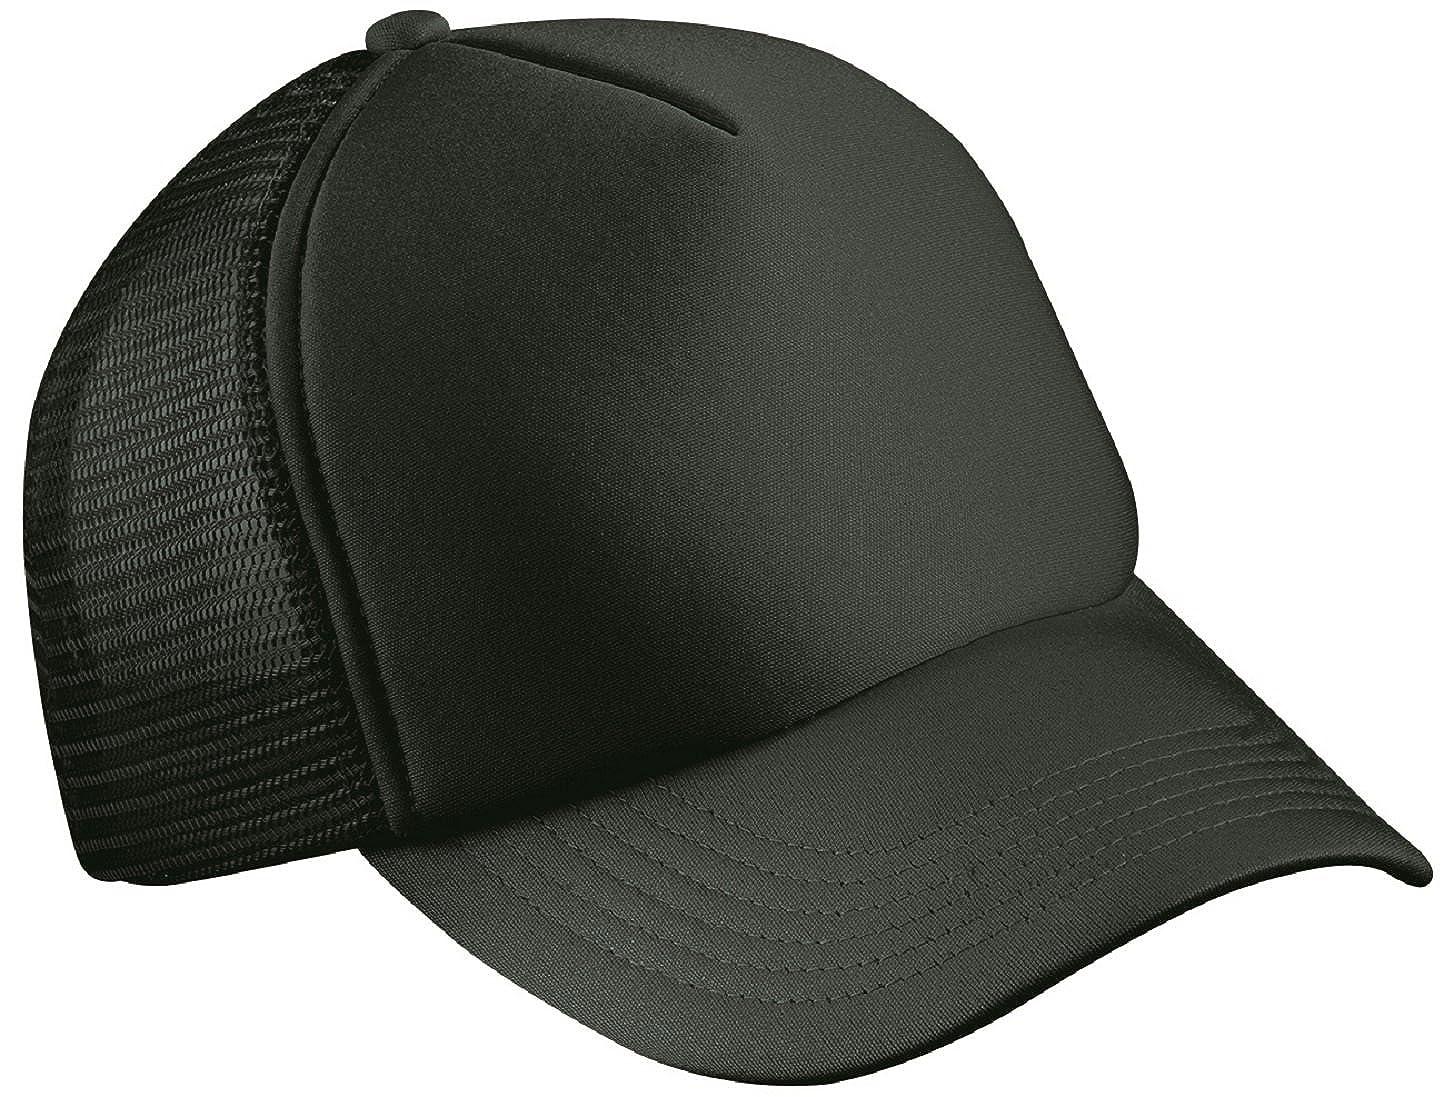 0fd9ecf7106 CLASSIC TRUCKER CAP HALF MESH HAT - 22 GREAT COLOURS (MB070) (BLACK)   Amazon.co.uk  Clothing